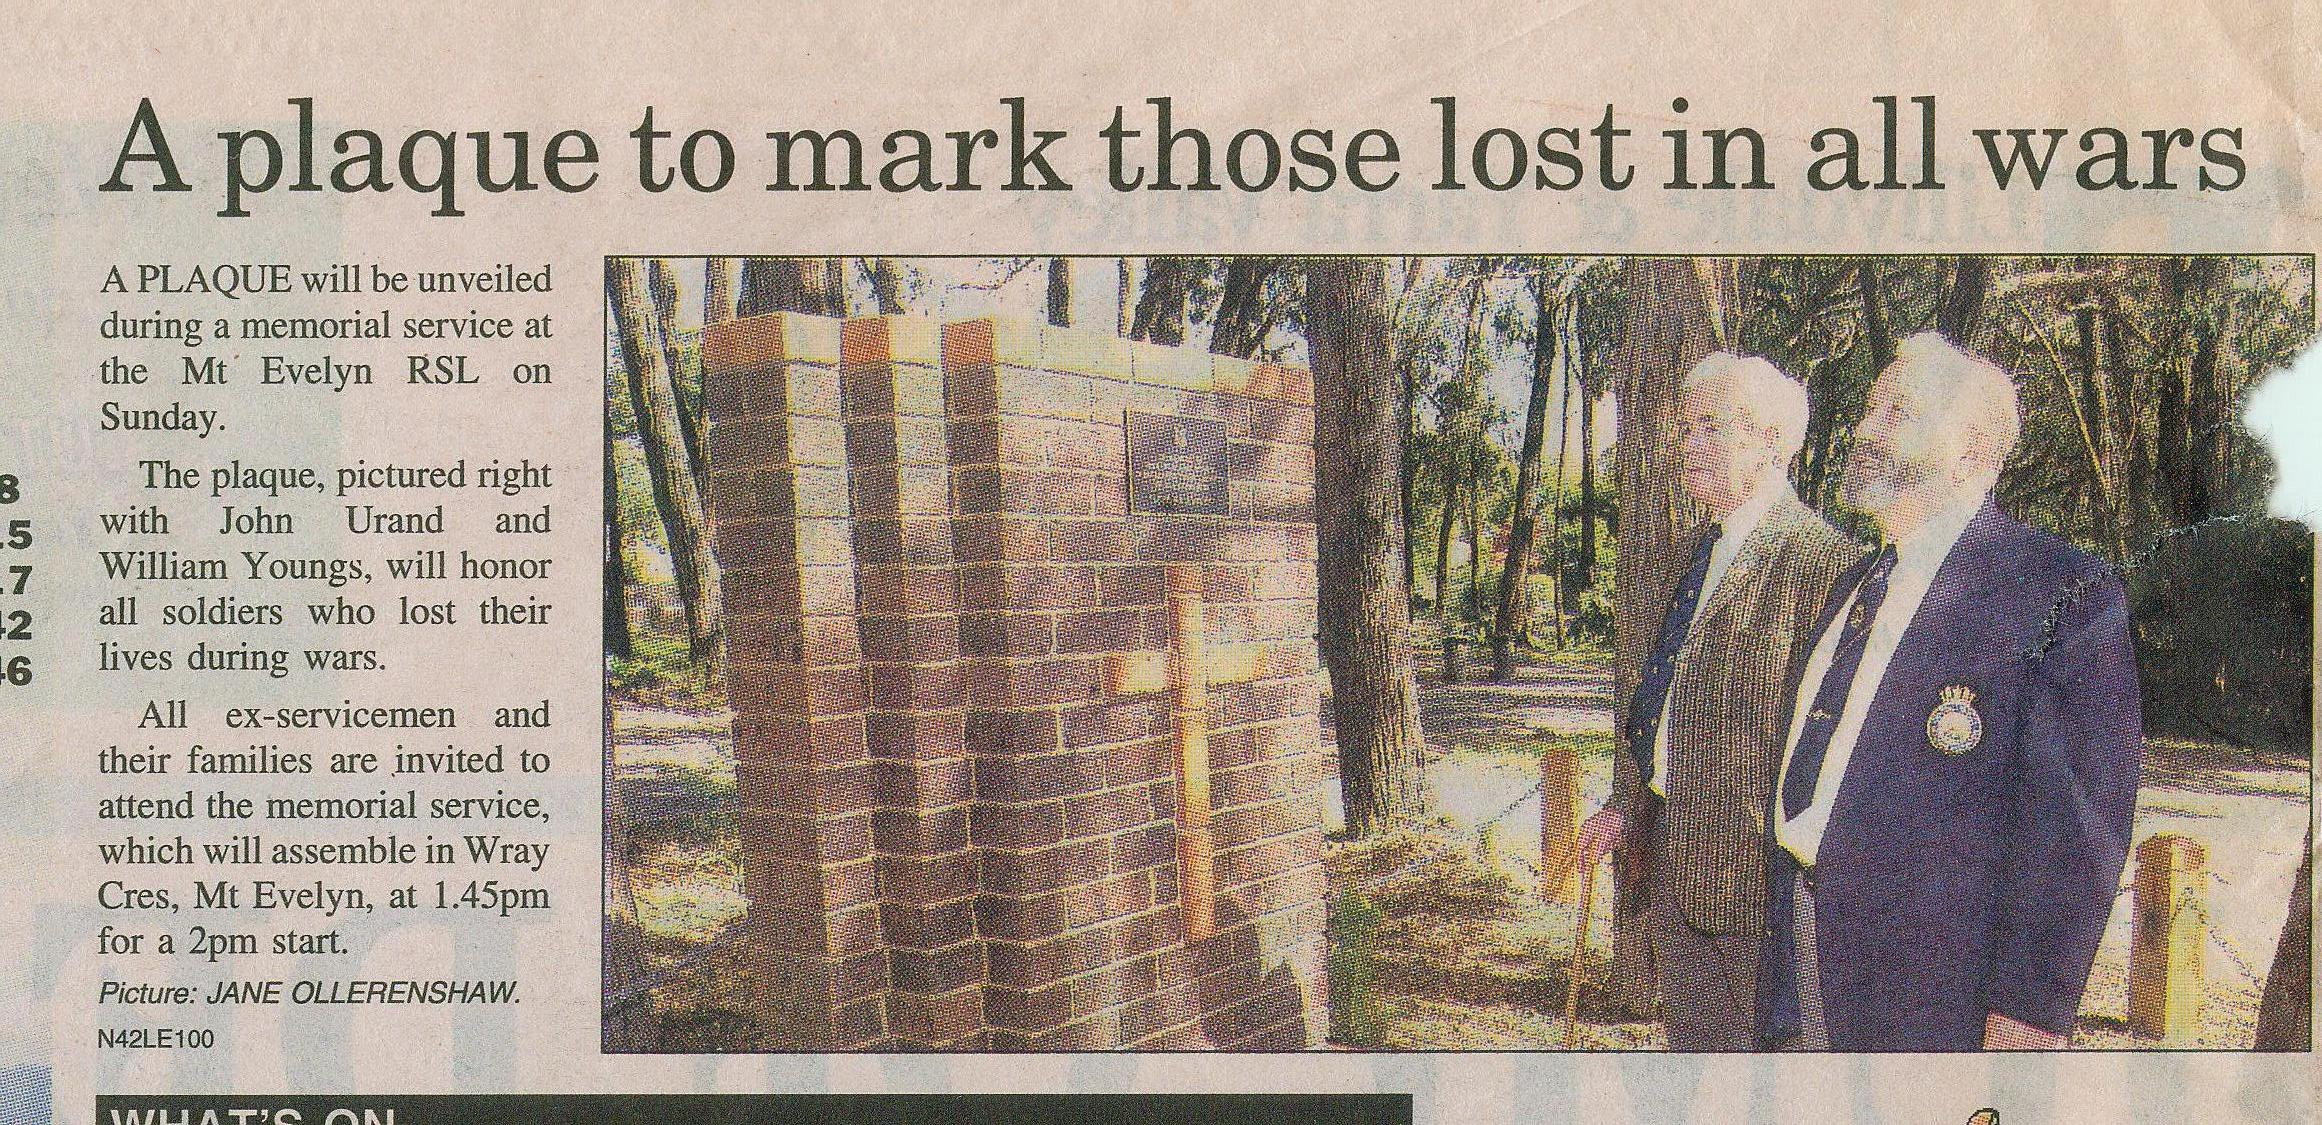 april 16th 2001